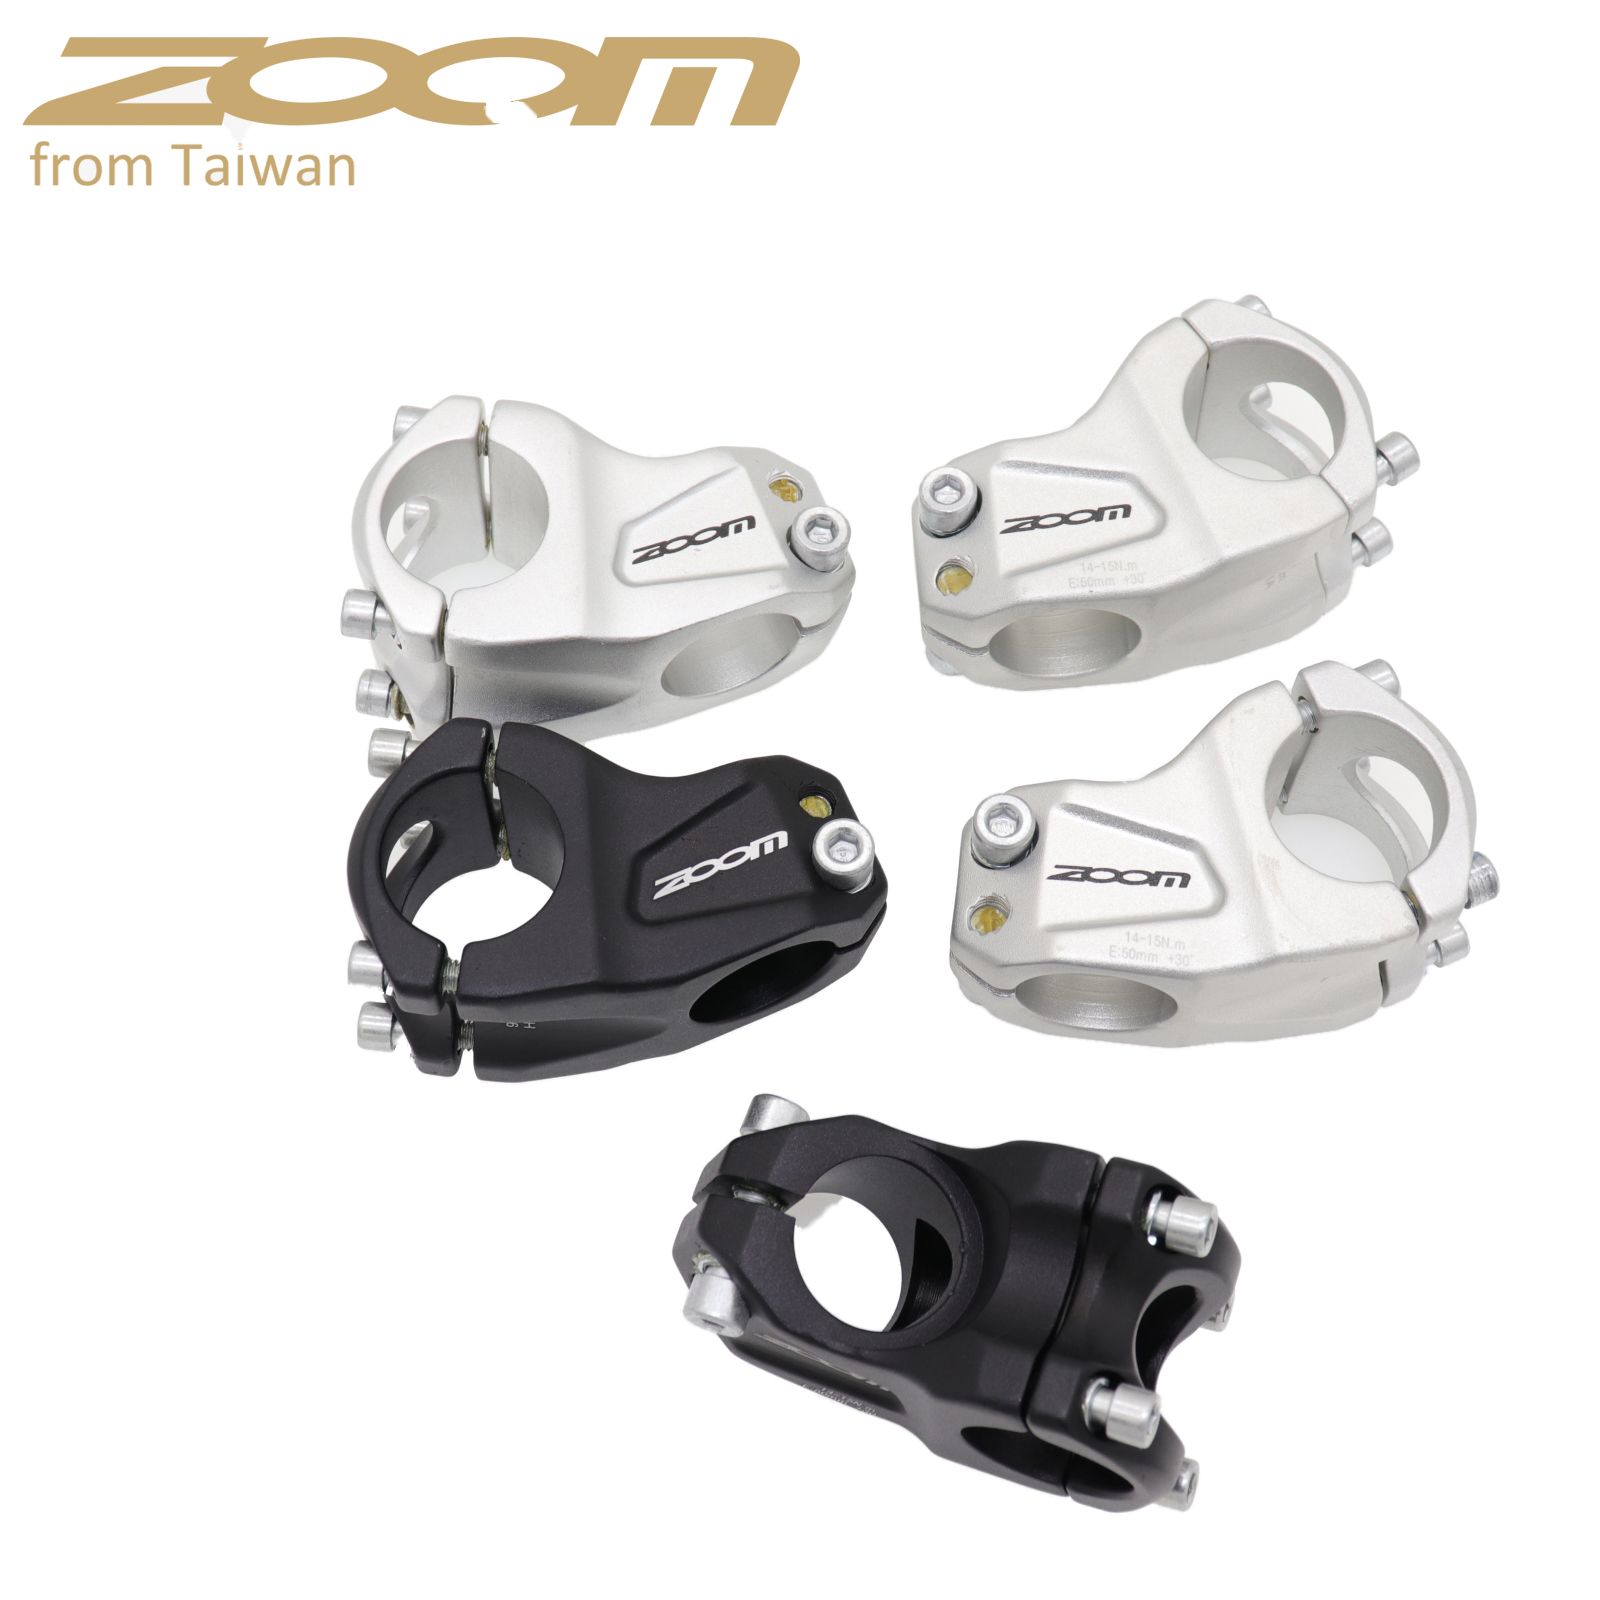 Zoom bike stem 30 degree downhill cross-country DH FR XC BMX mountain bike MTB bicycle handlebar 31.8 50MM